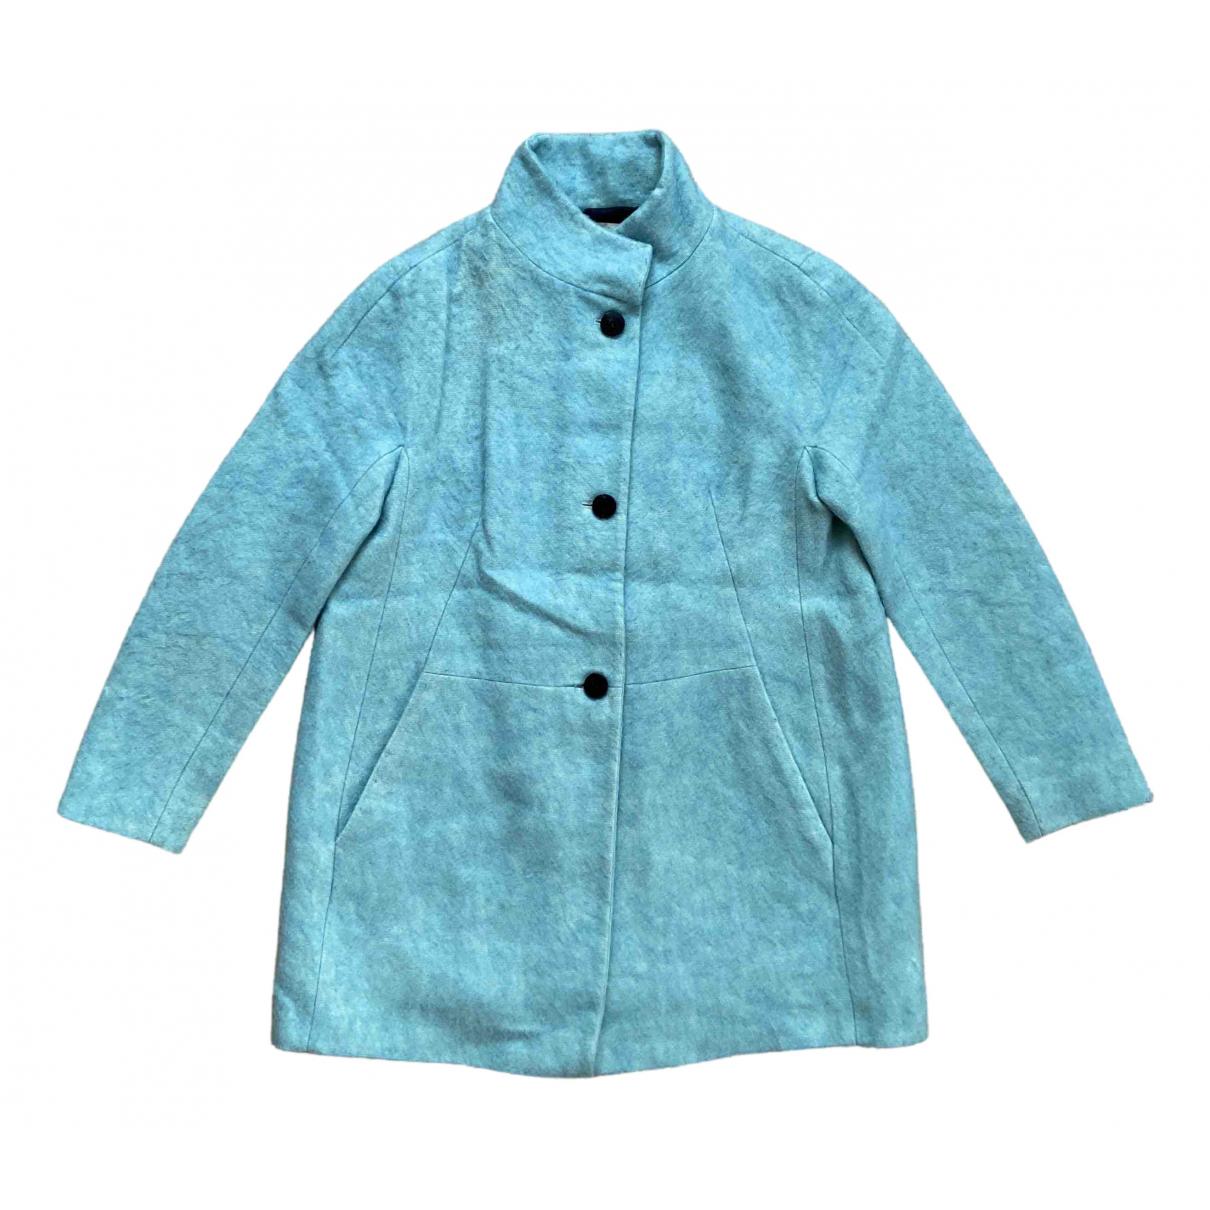 Zara \N Turquoise Wool coat for Women S International